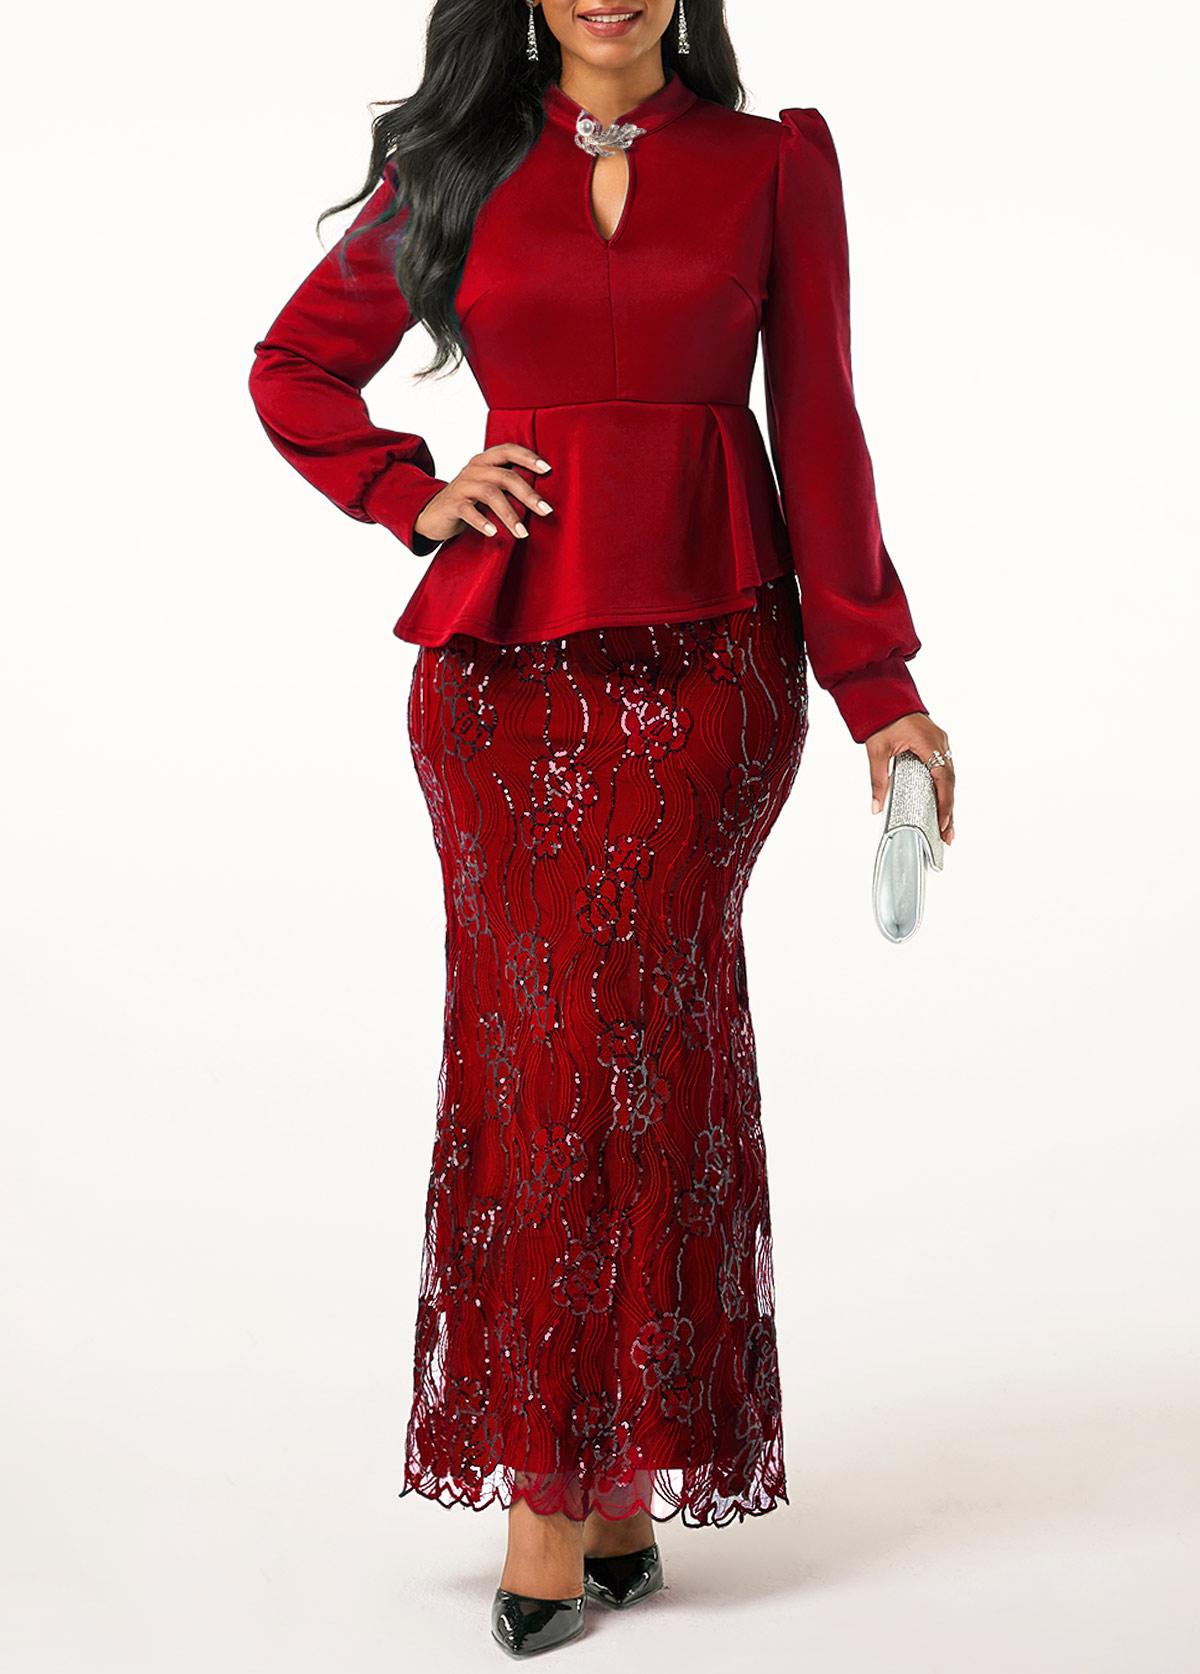 Peplum Waist Lace Patchwork Wine Red Dress